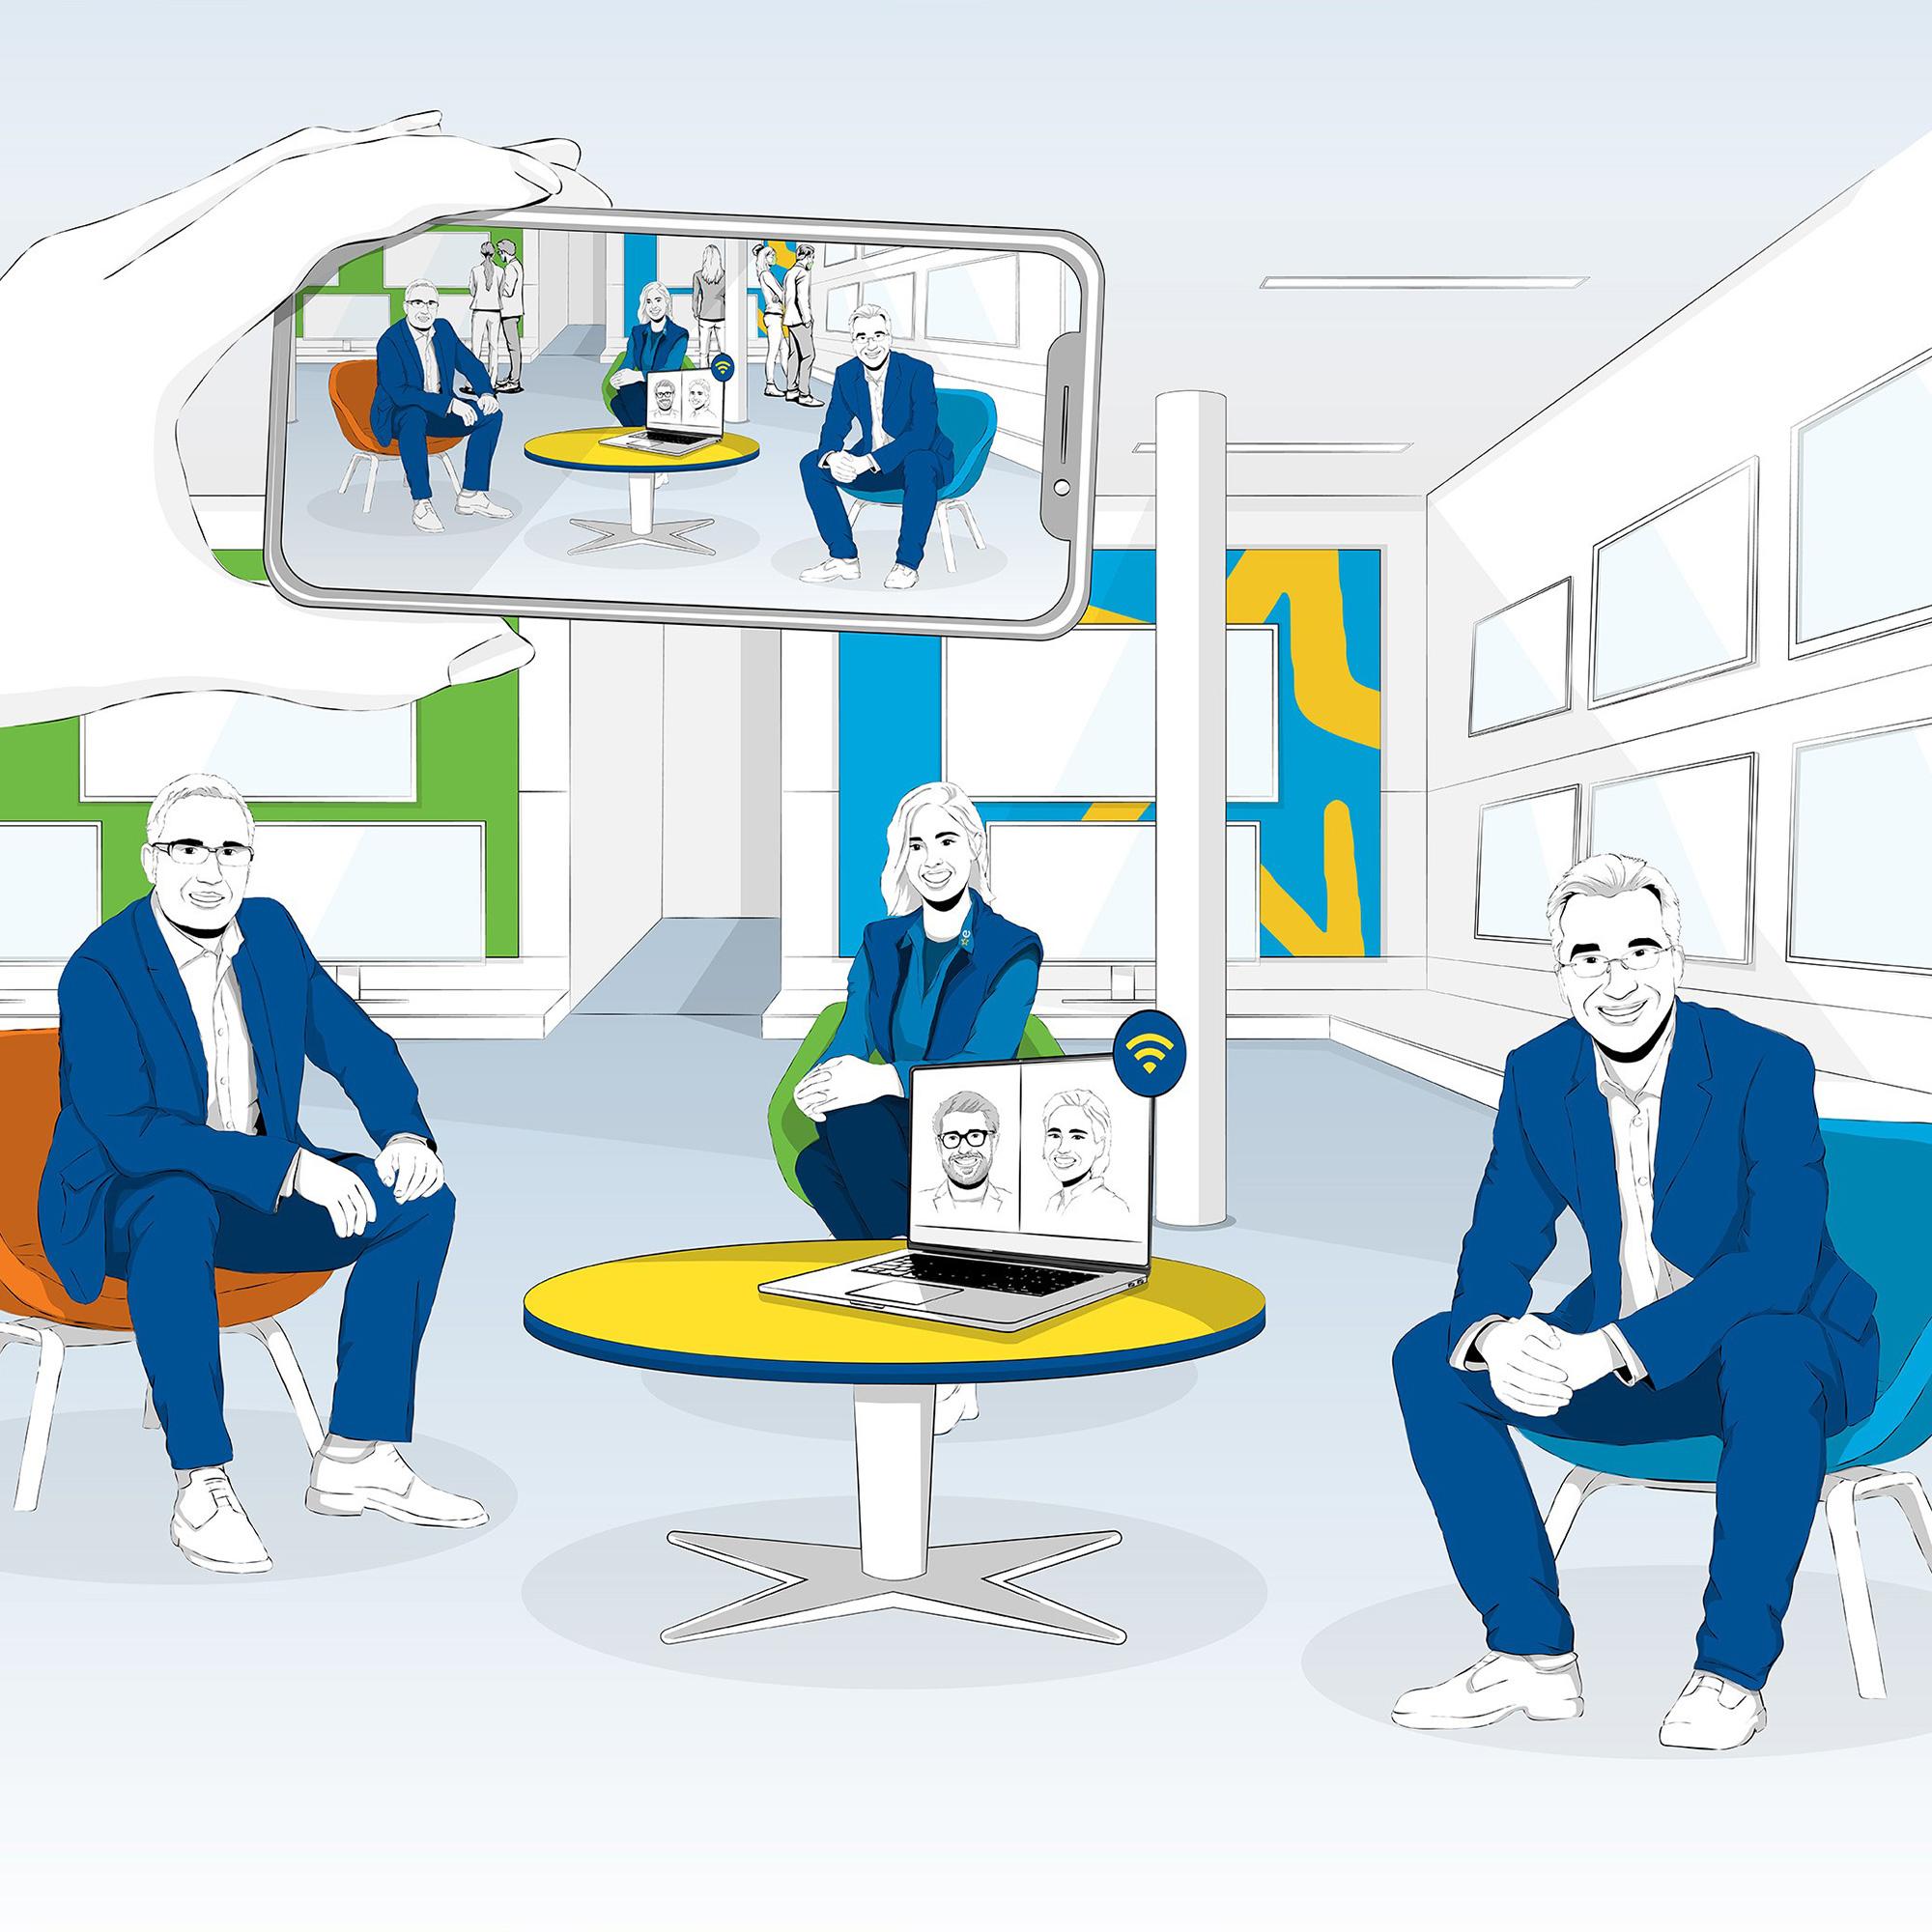 EURONICS; Kommunikation; Consumer Electronics PR; Kommunikationsstrategie